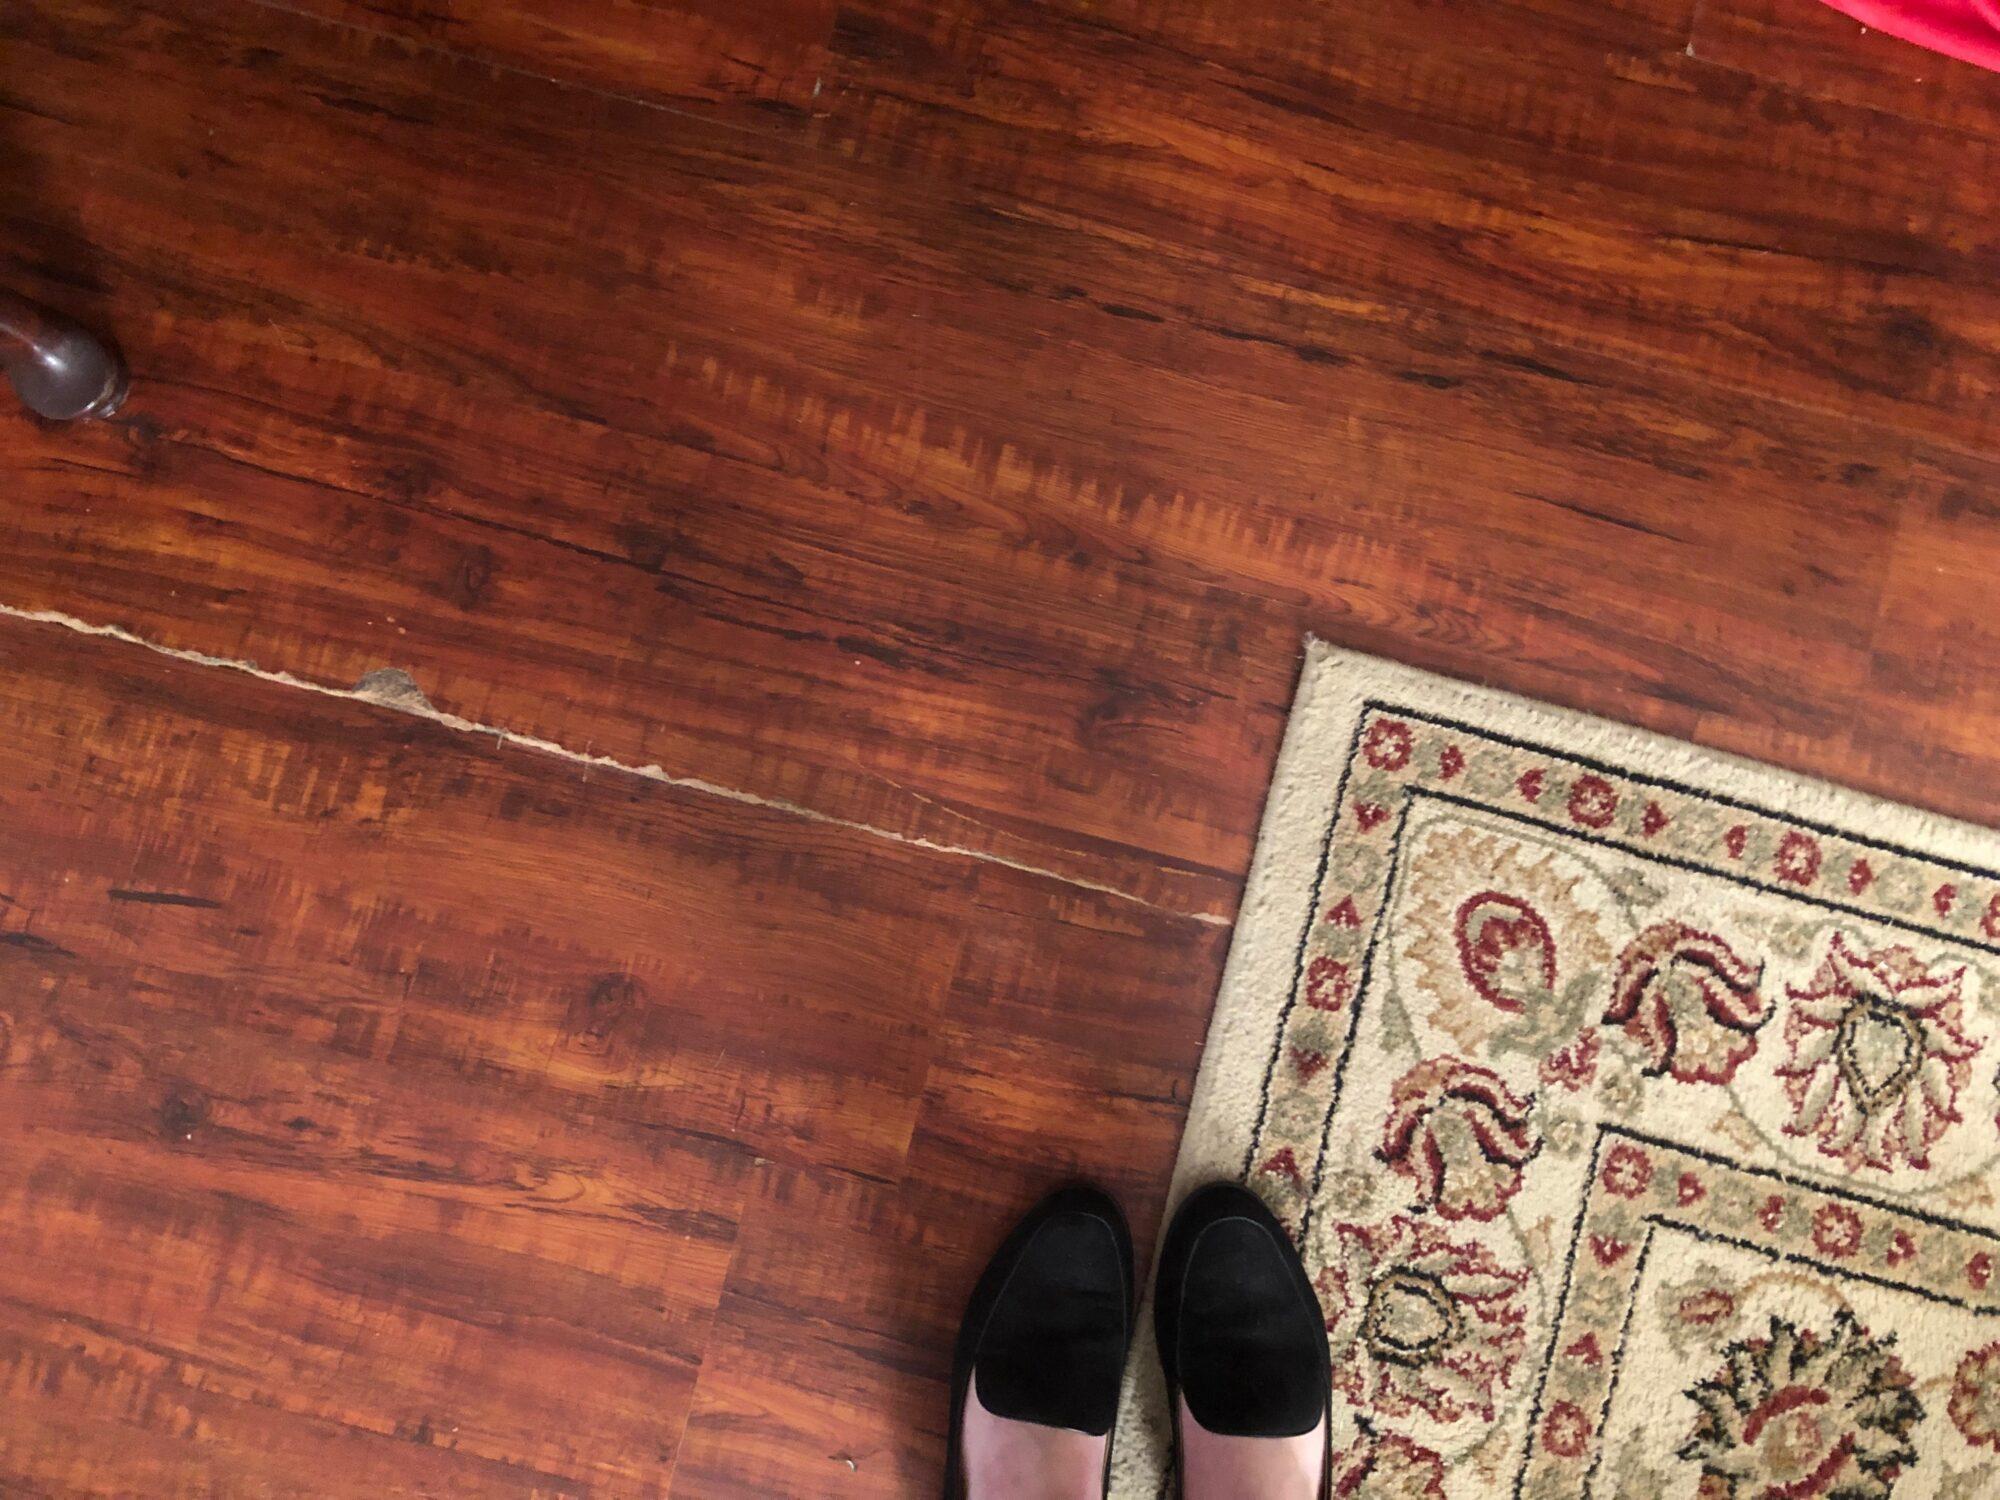 Home Repairs for Christmas: Meet Ms. Nancy